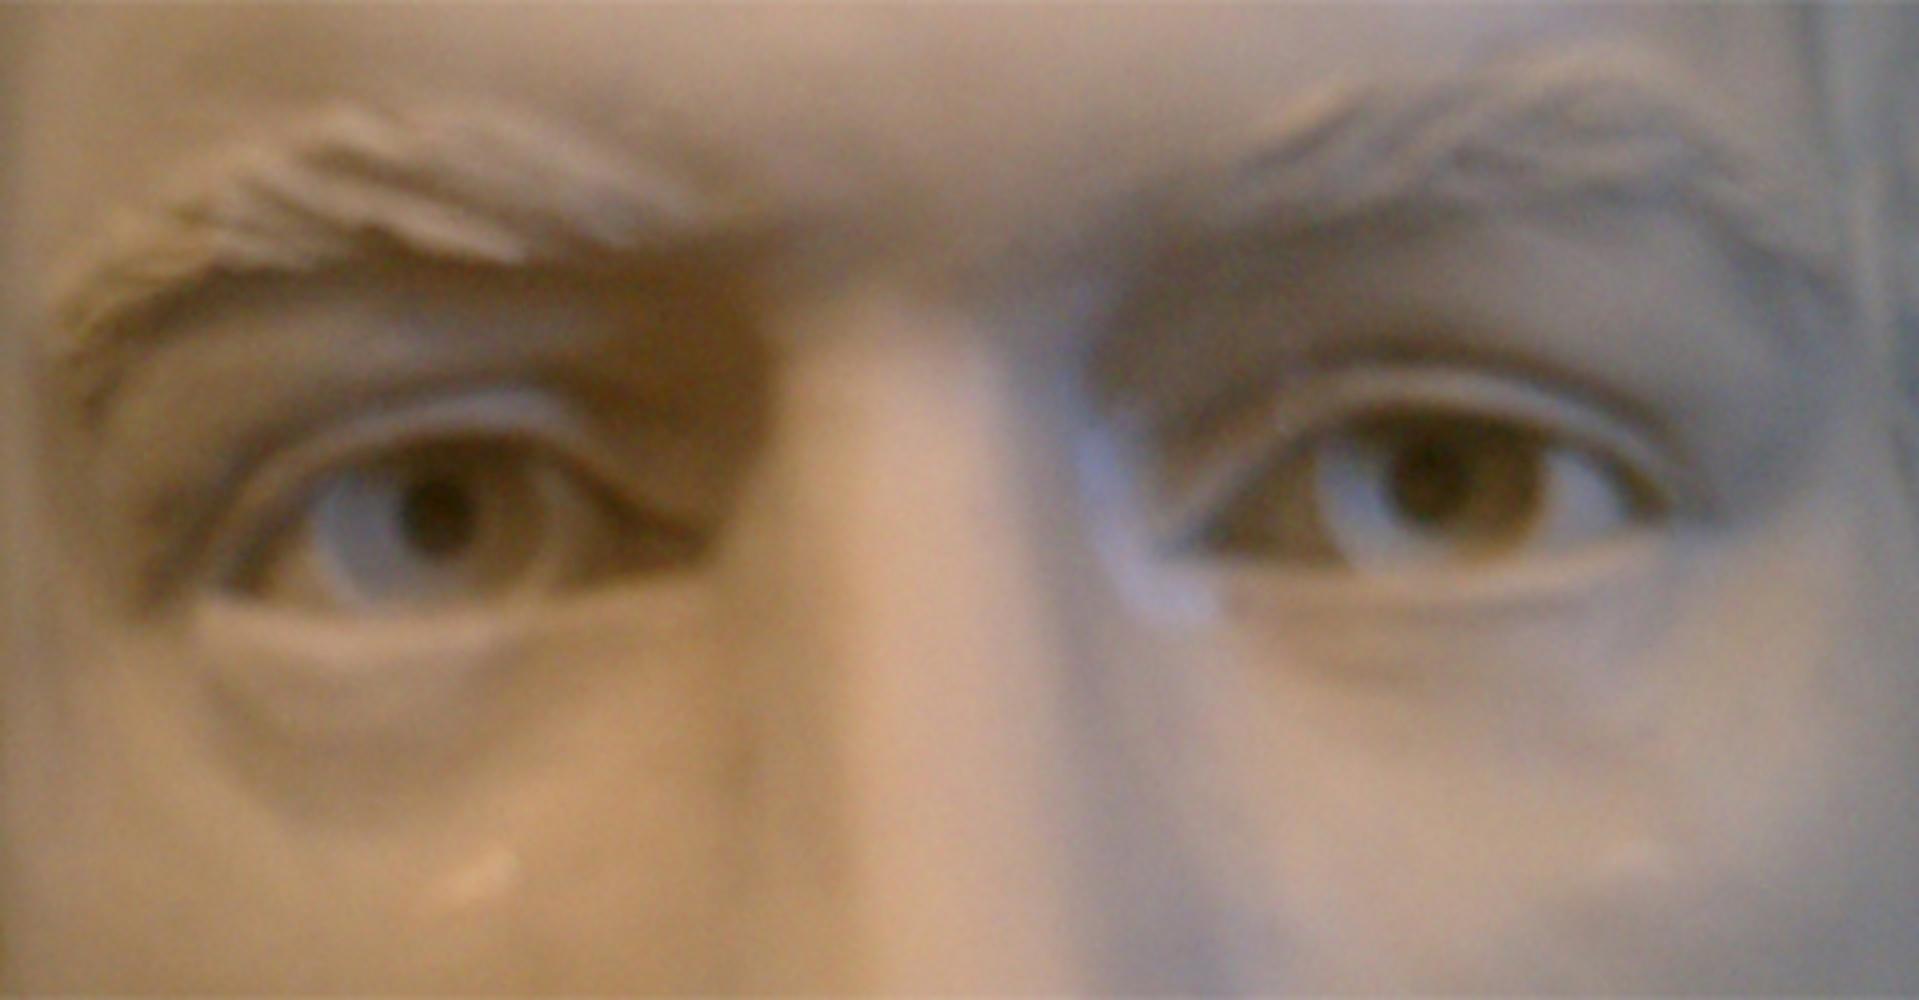 Hollow eyes.thumb